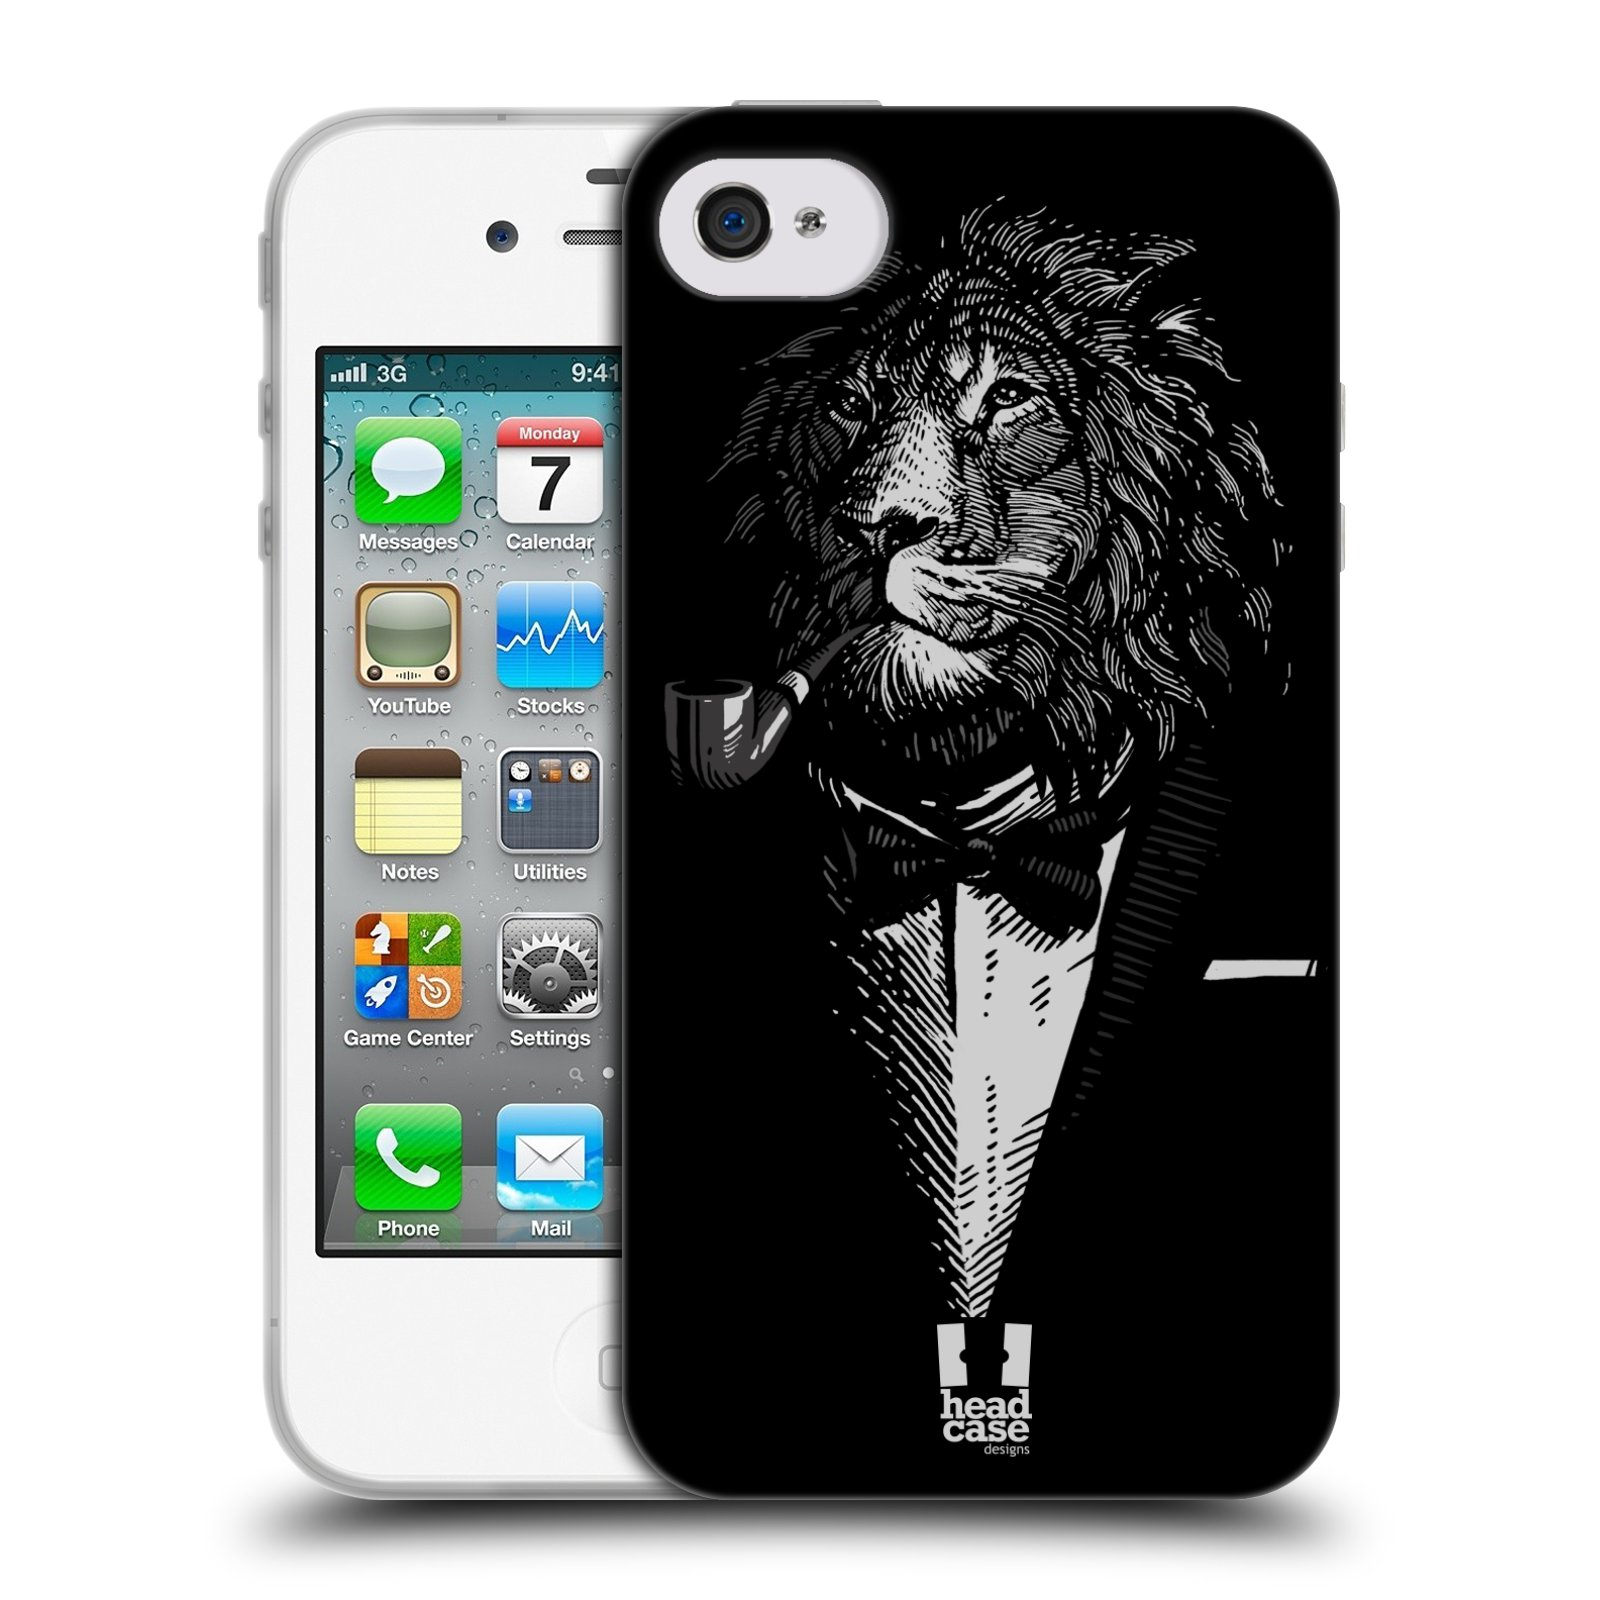 HEAD CASE silikonový obal na mobil Apple Iphone 4/4S vzor Zvíře v obleku lev